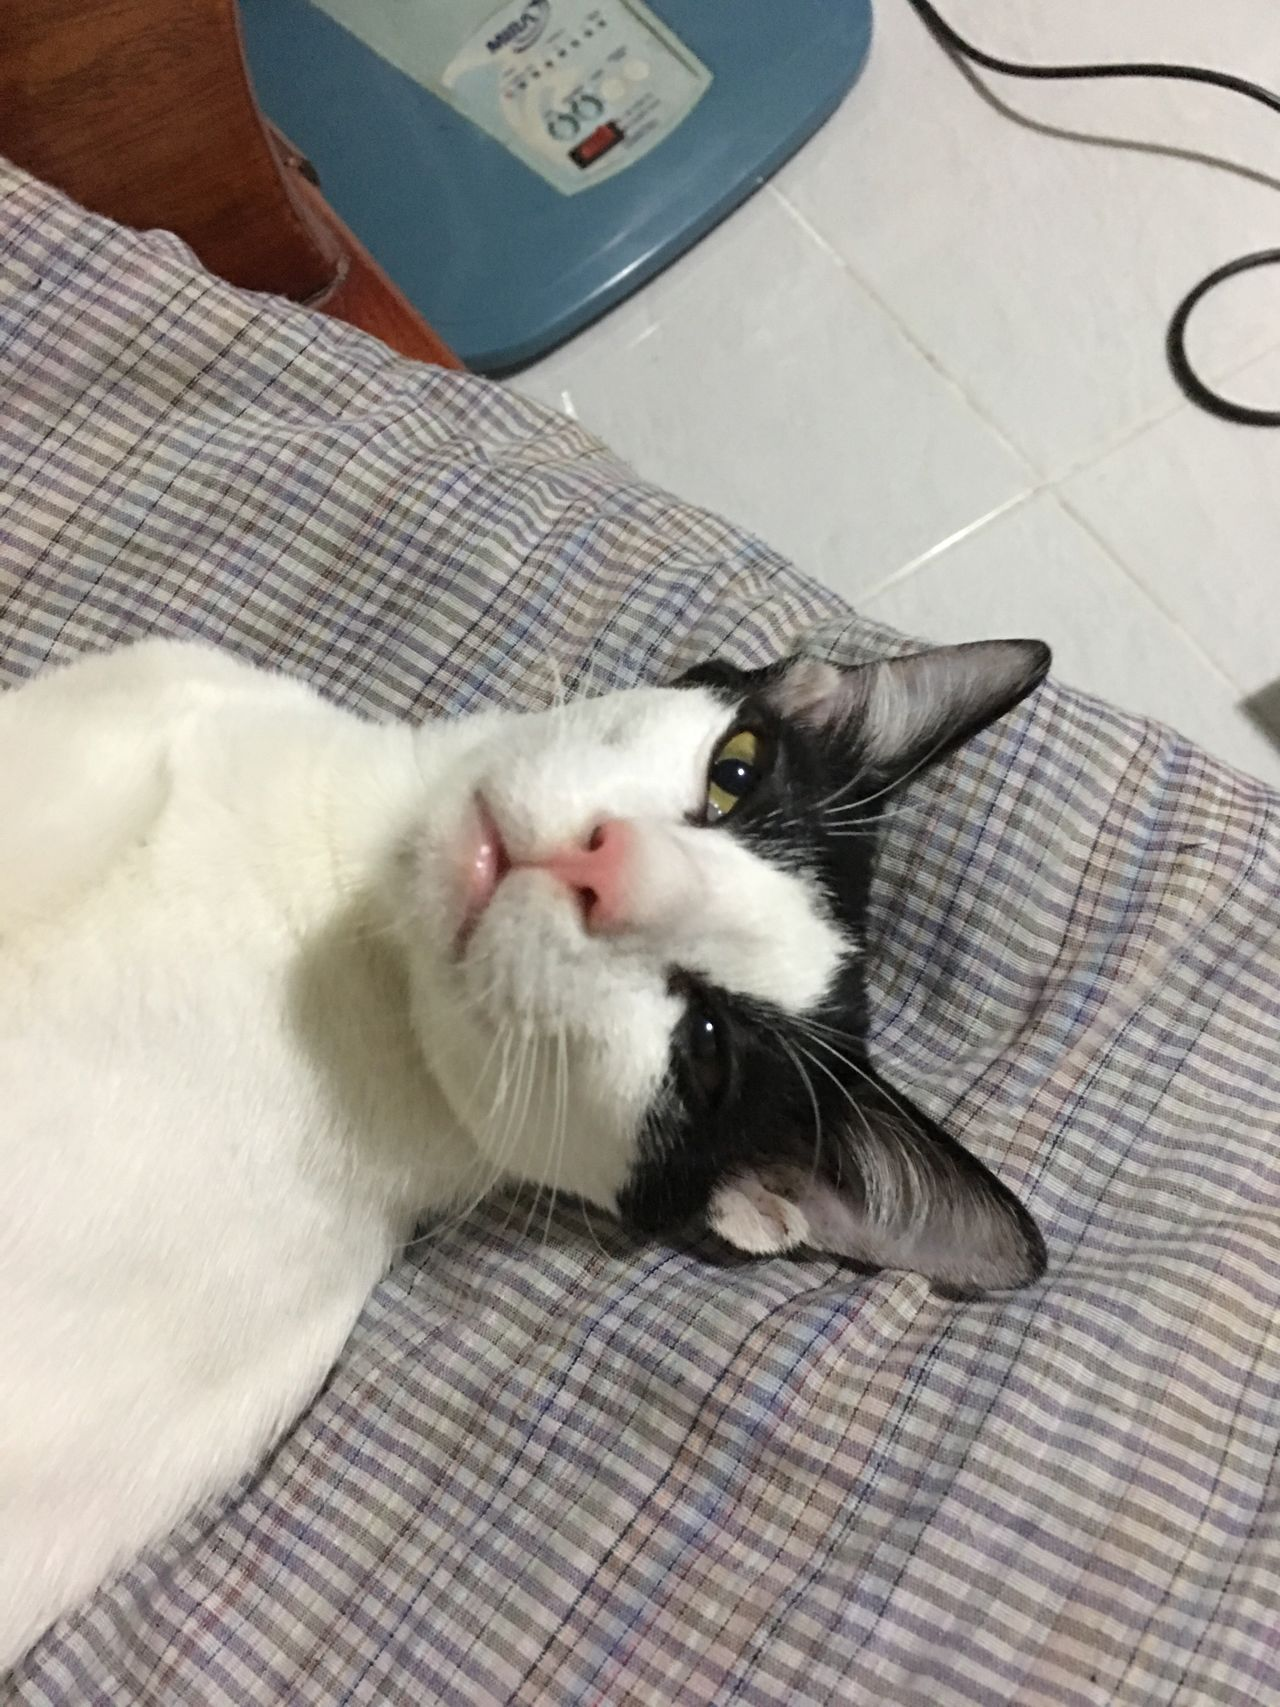 When you are still dizzy after woke up... Cat Dizzy Wake Up Pet Minney EyeEm